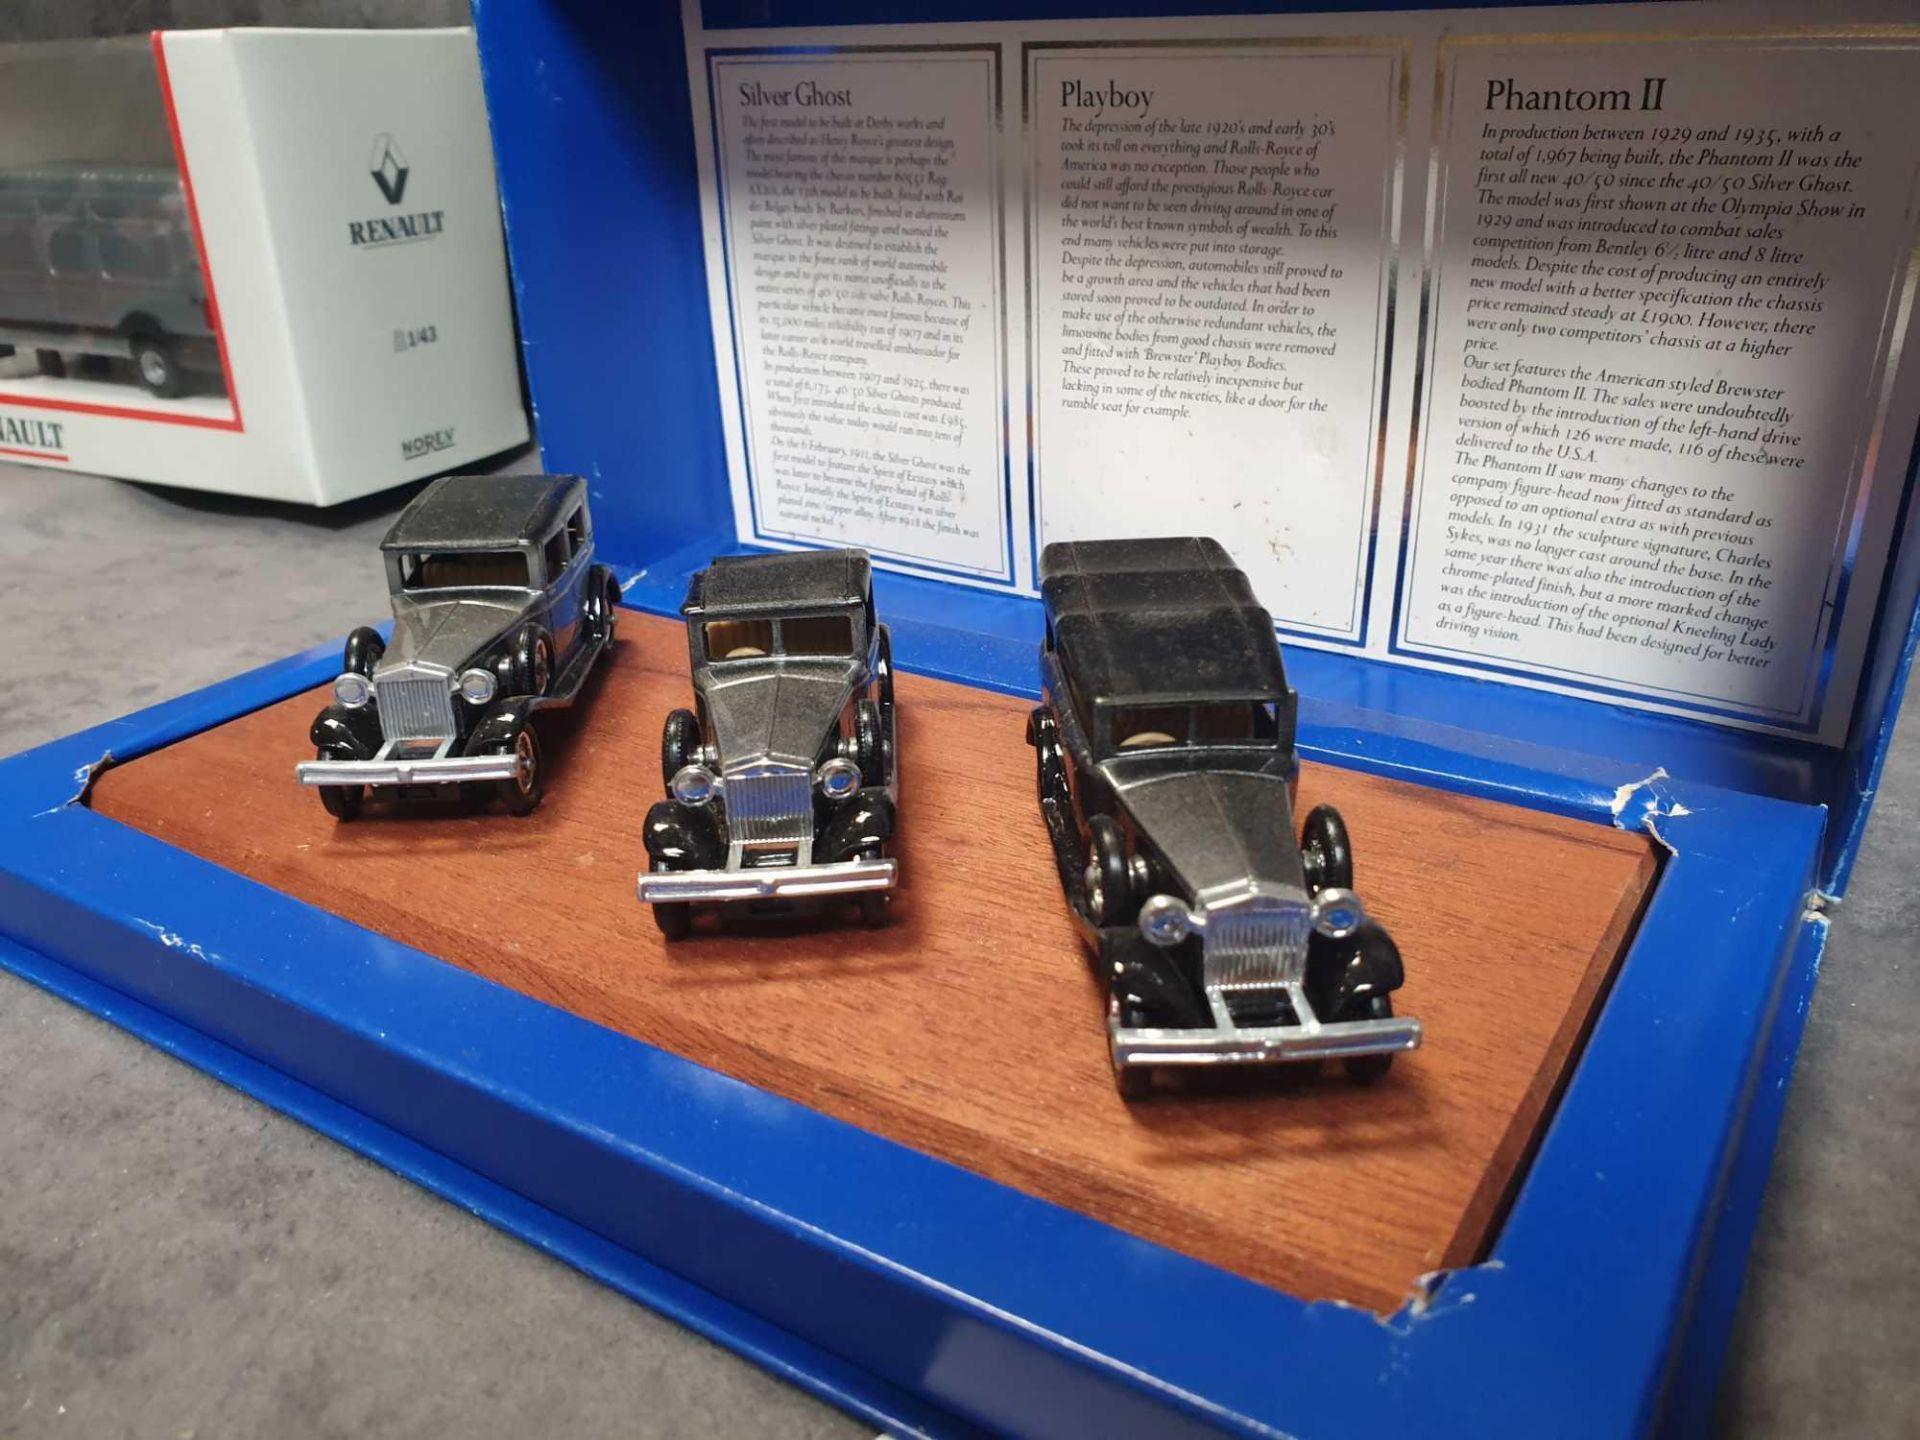 Lot 1275 - Lledo Vintage Rolls Royce Collection 3 Cars On Wooden Display Plinth Mint Model